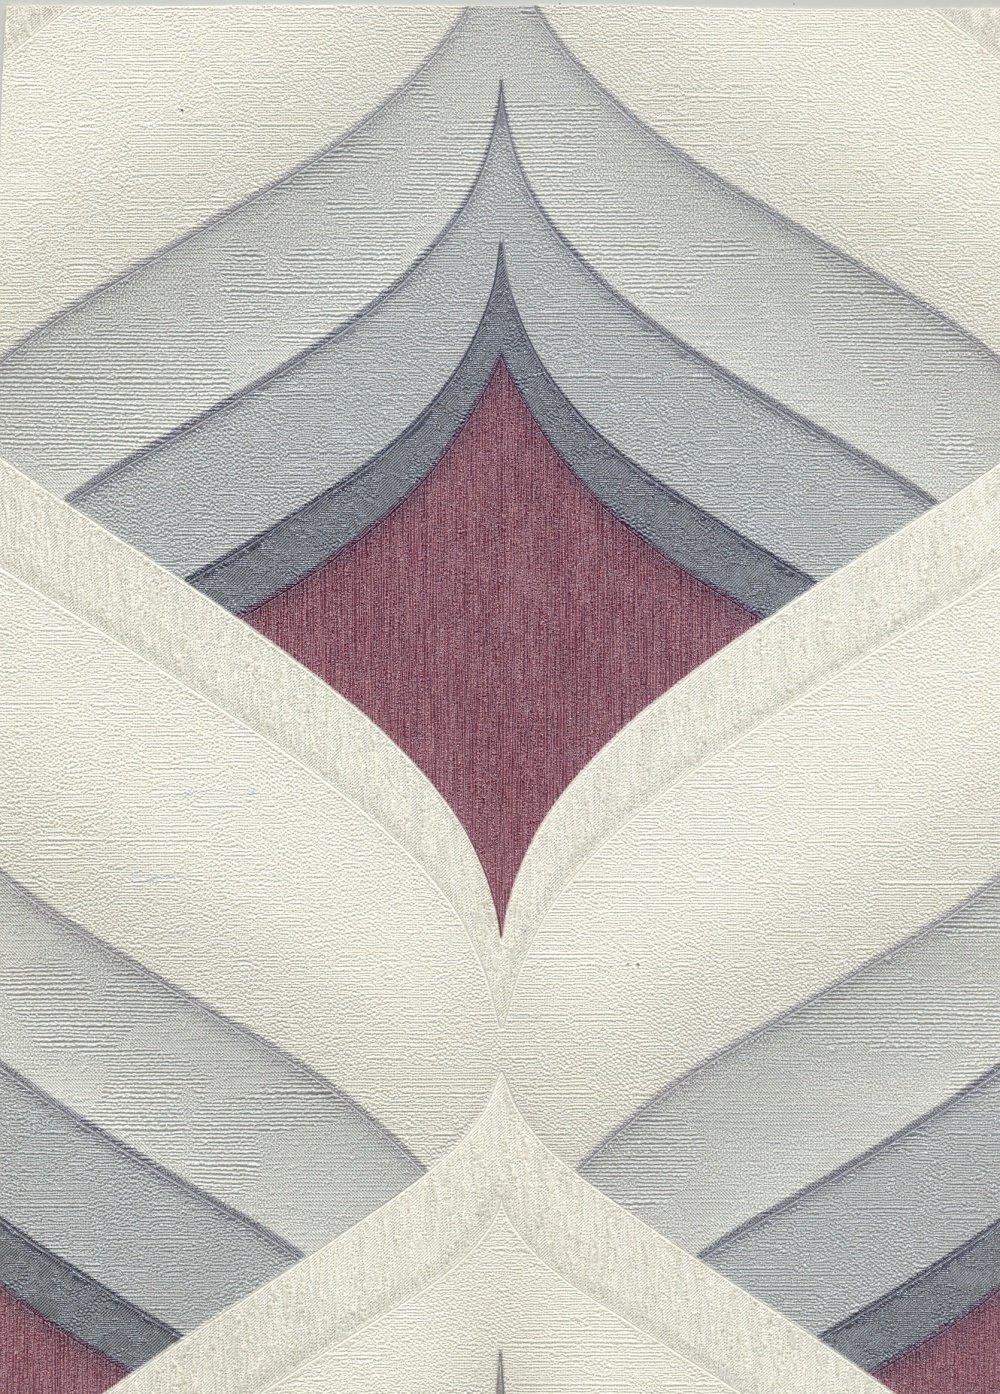 Солярис. Артикул 1089-ХХ. Обои красивые, горячее тиснение. Комбинируются с Солярис - фон.Артикул 1090-ХХ.